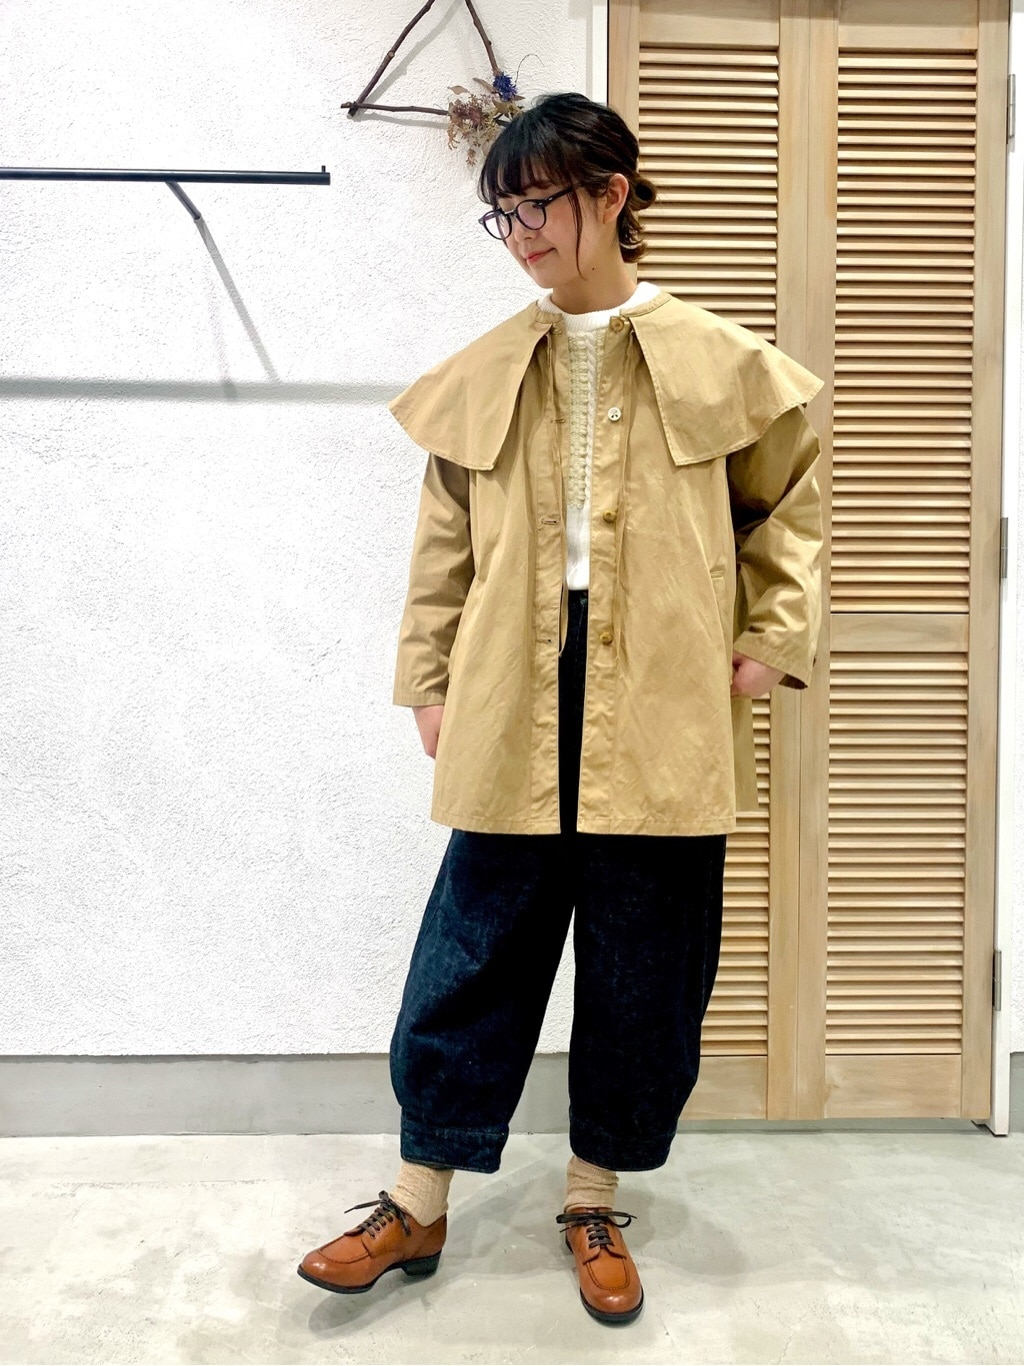 chambre de charme 横浜ジョイナス 身長:162cm 2021.01.12